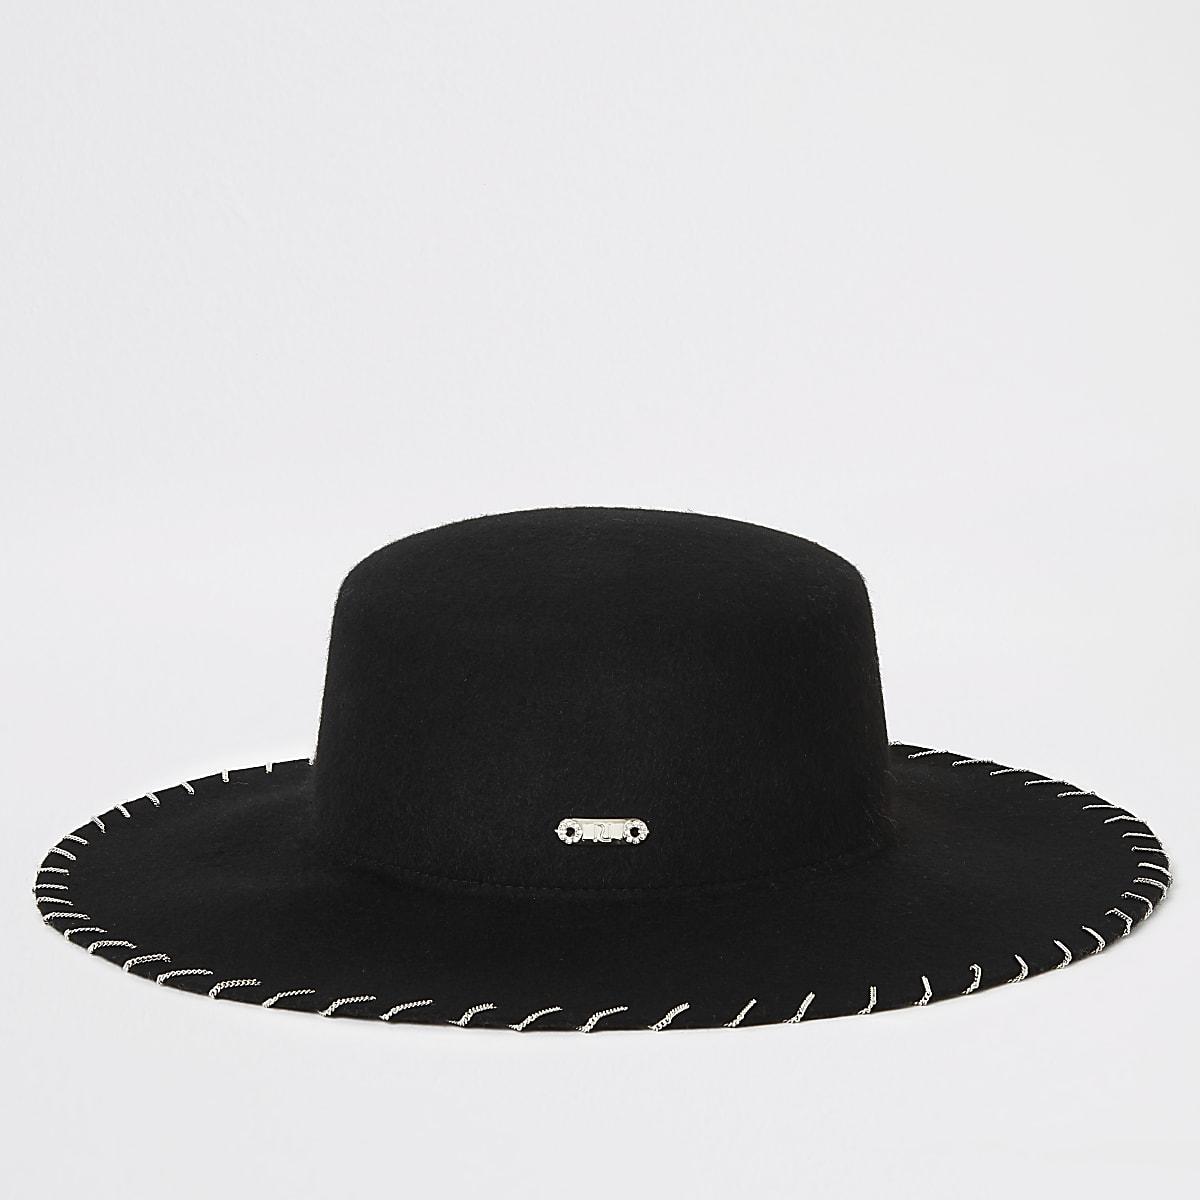 Black chain stitch Fedora hat